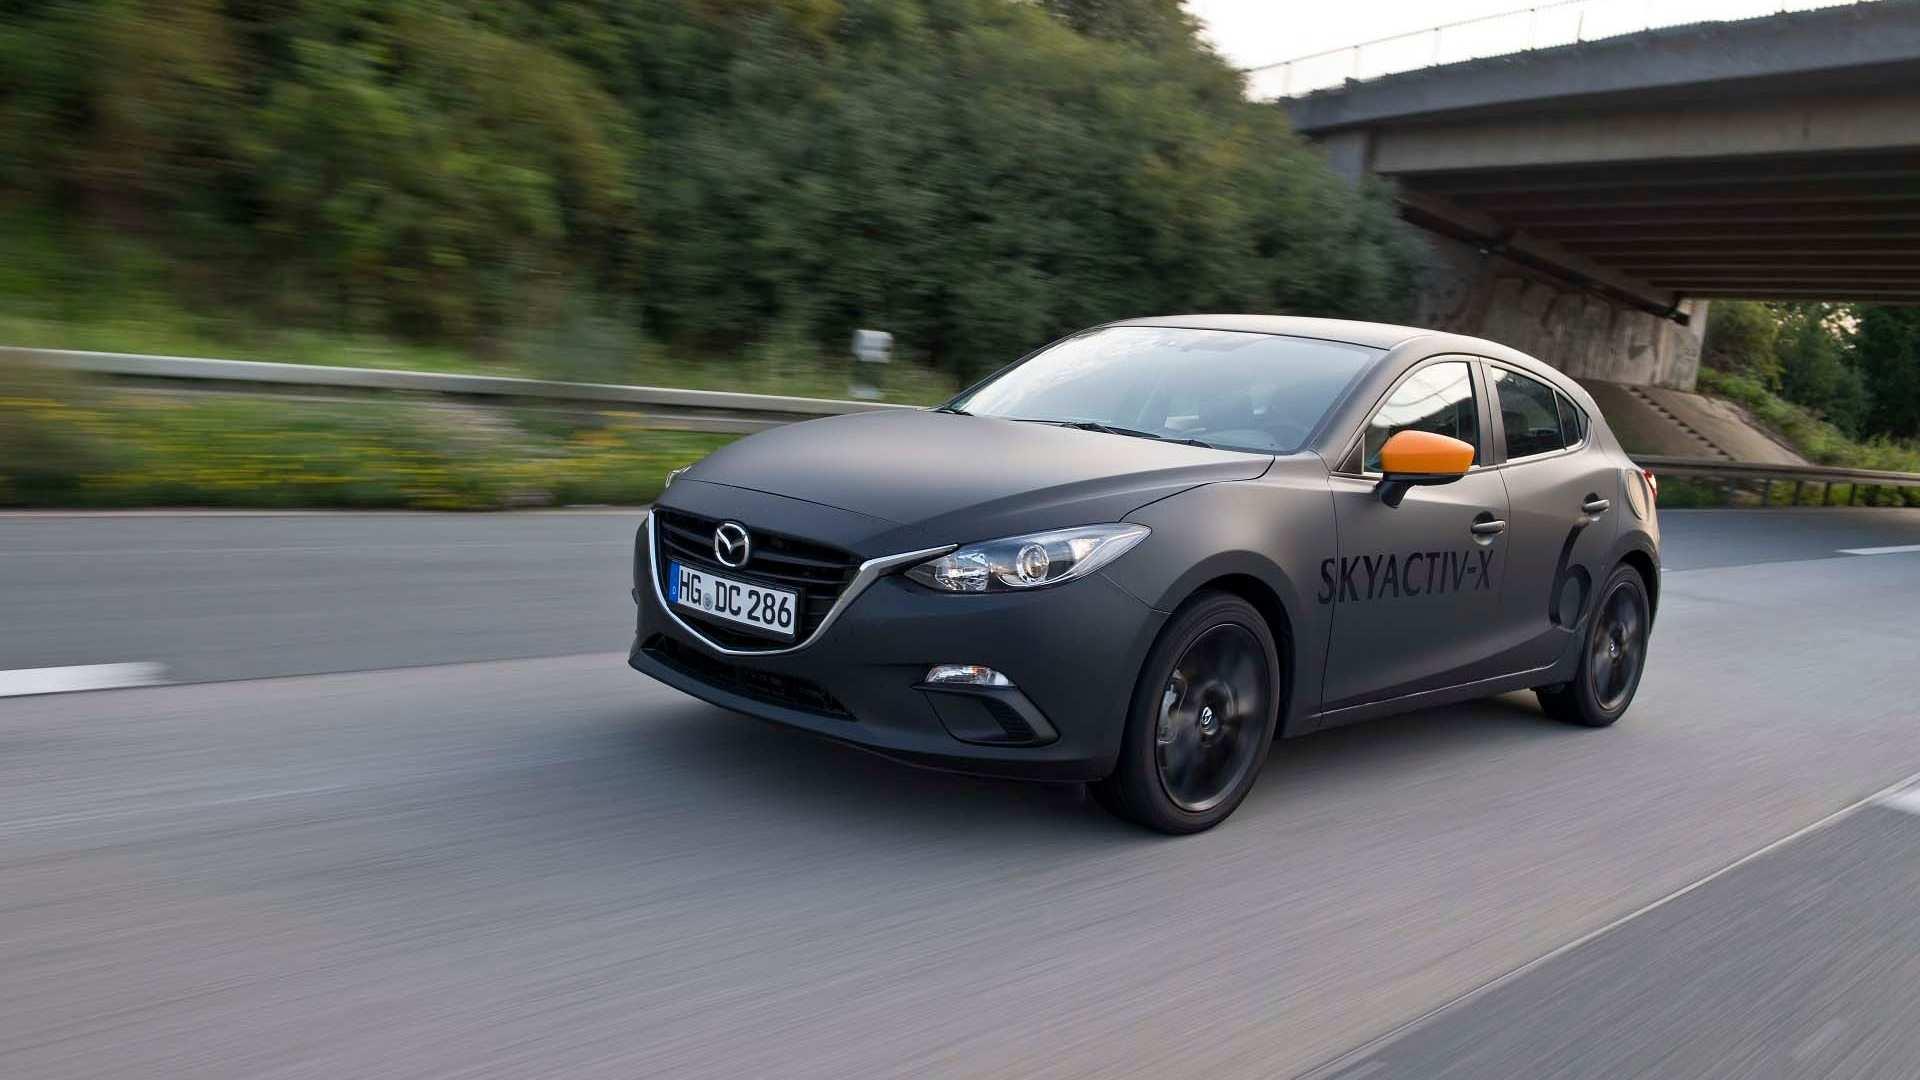 73 New Mazda 2020 Hatchback Research New by Mazda 2020 Hatchback